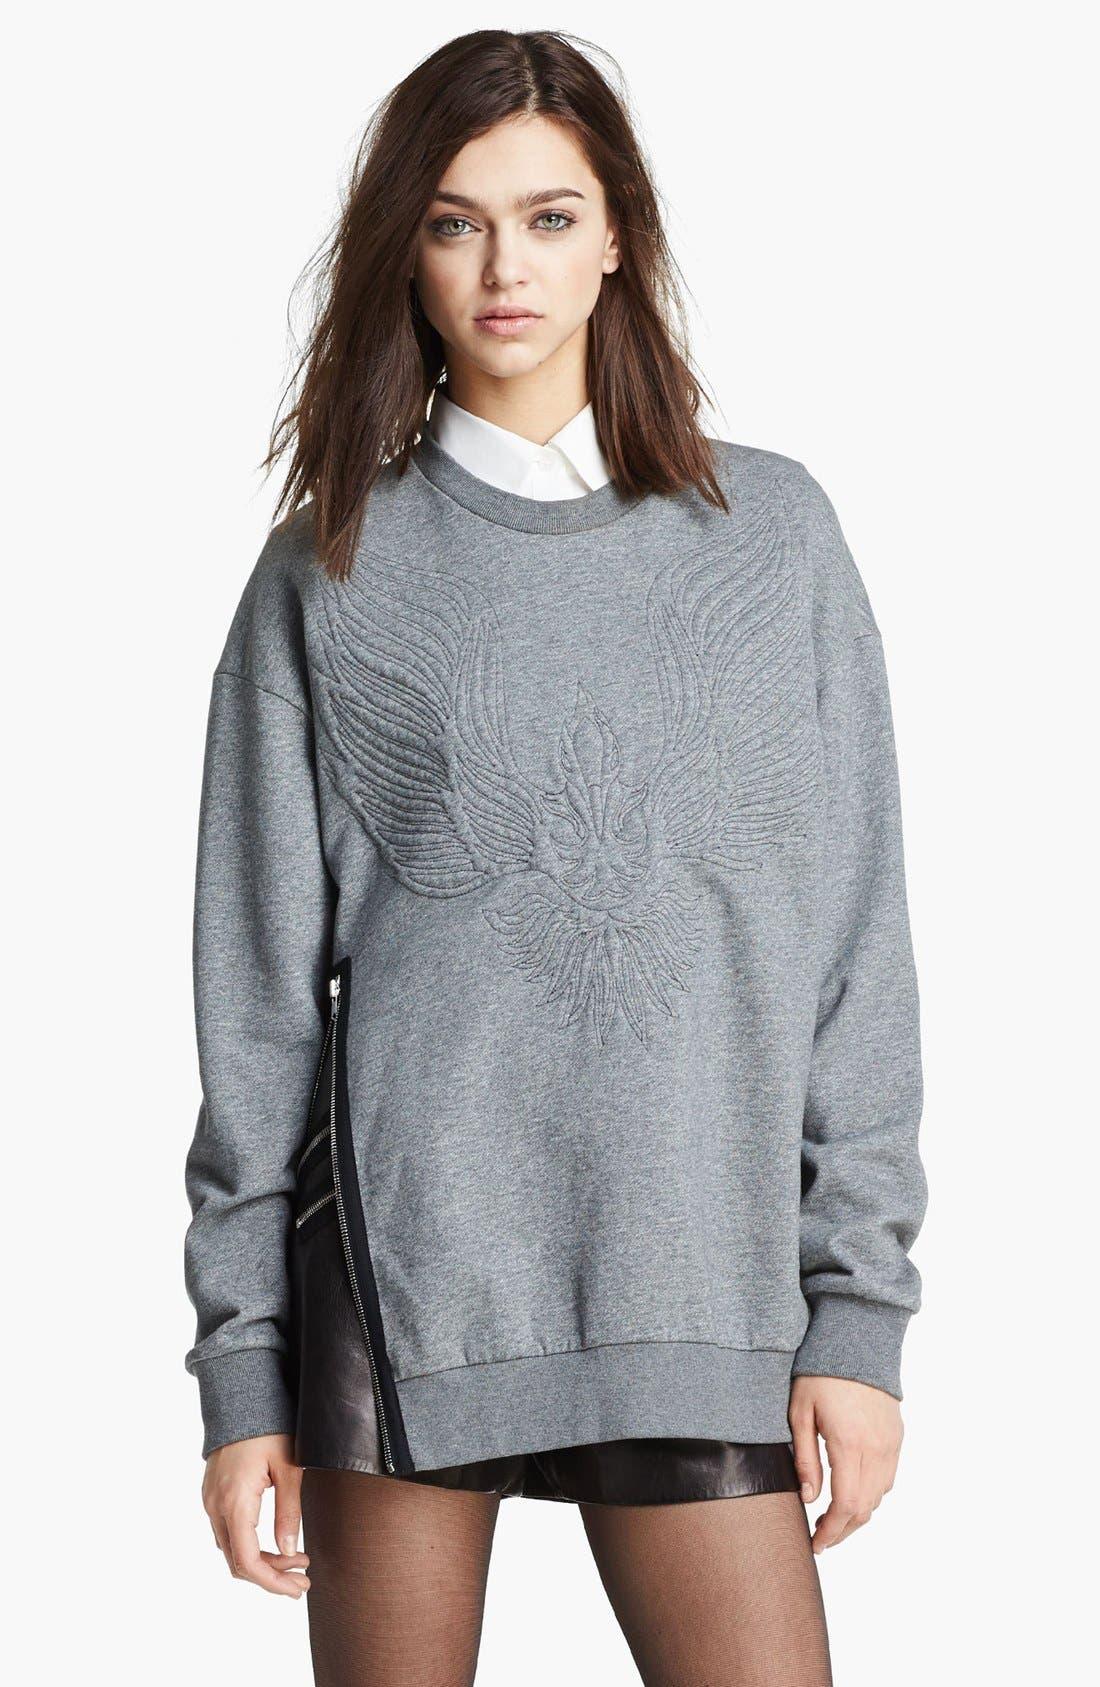 Alternate Image 1 Selected - 3.1 Phillip Lim Quilted Phoenix Oversized Sweatshirt